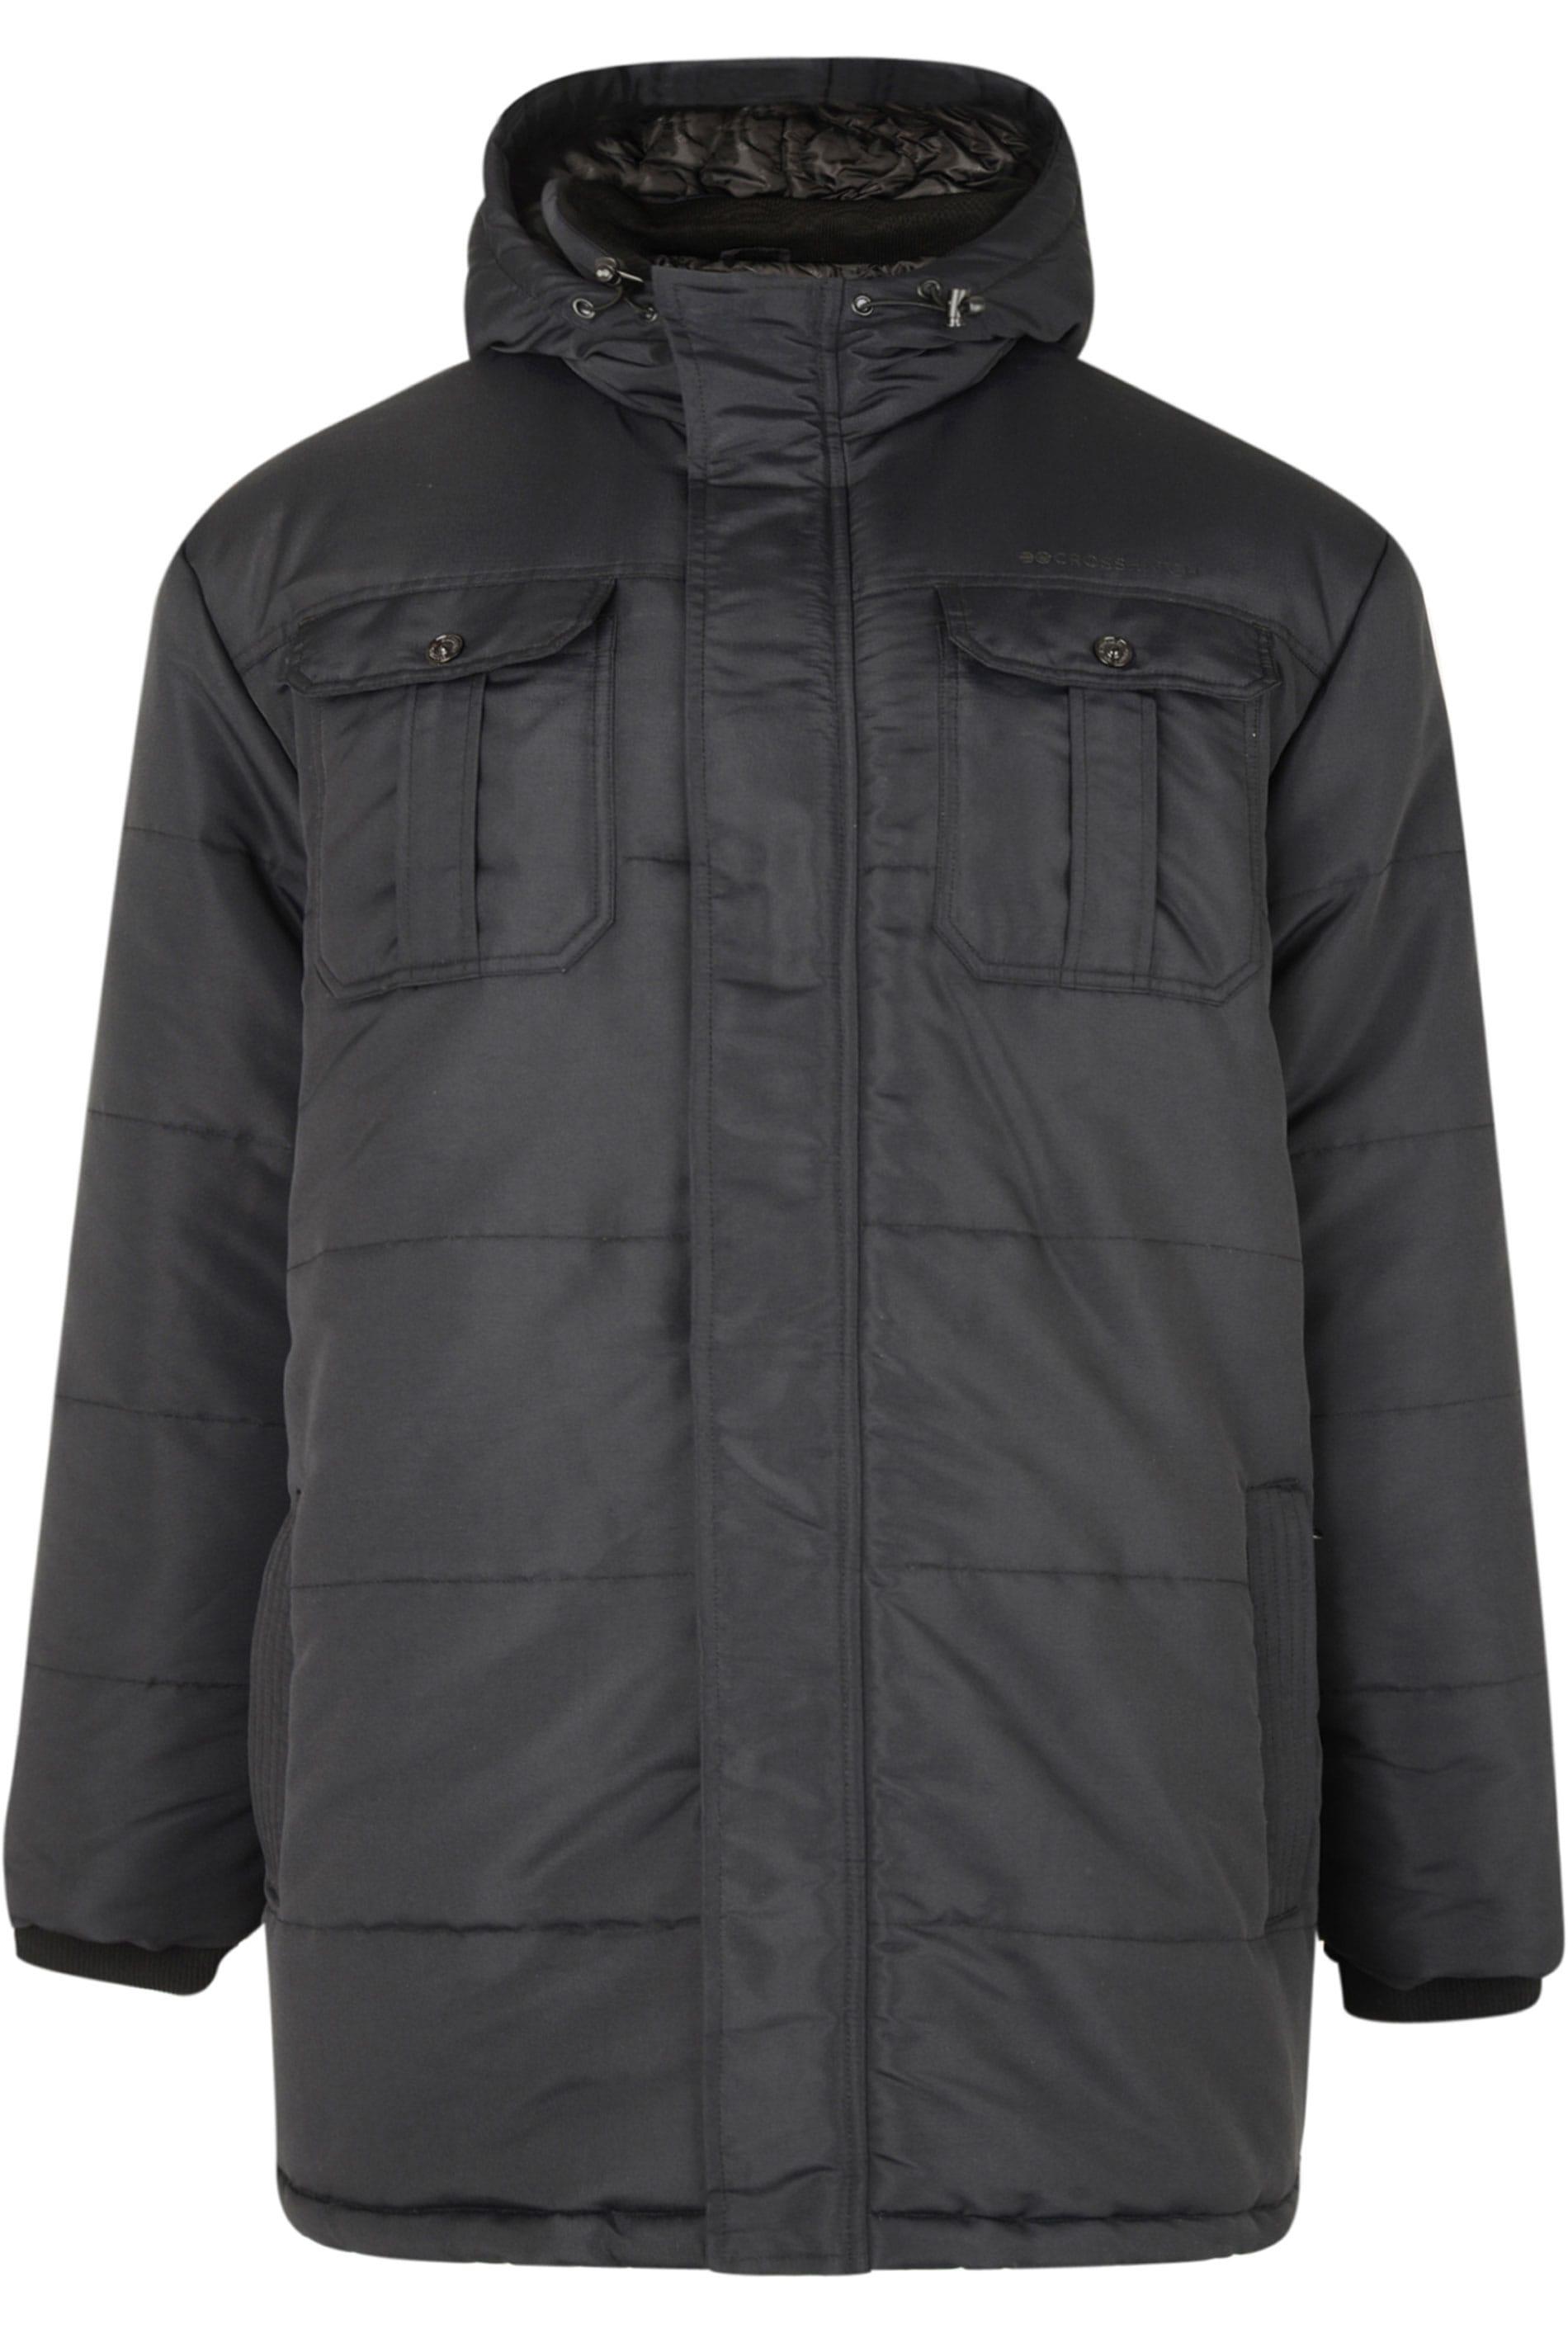 CROSSHATCH Black Padded Parka Jacket